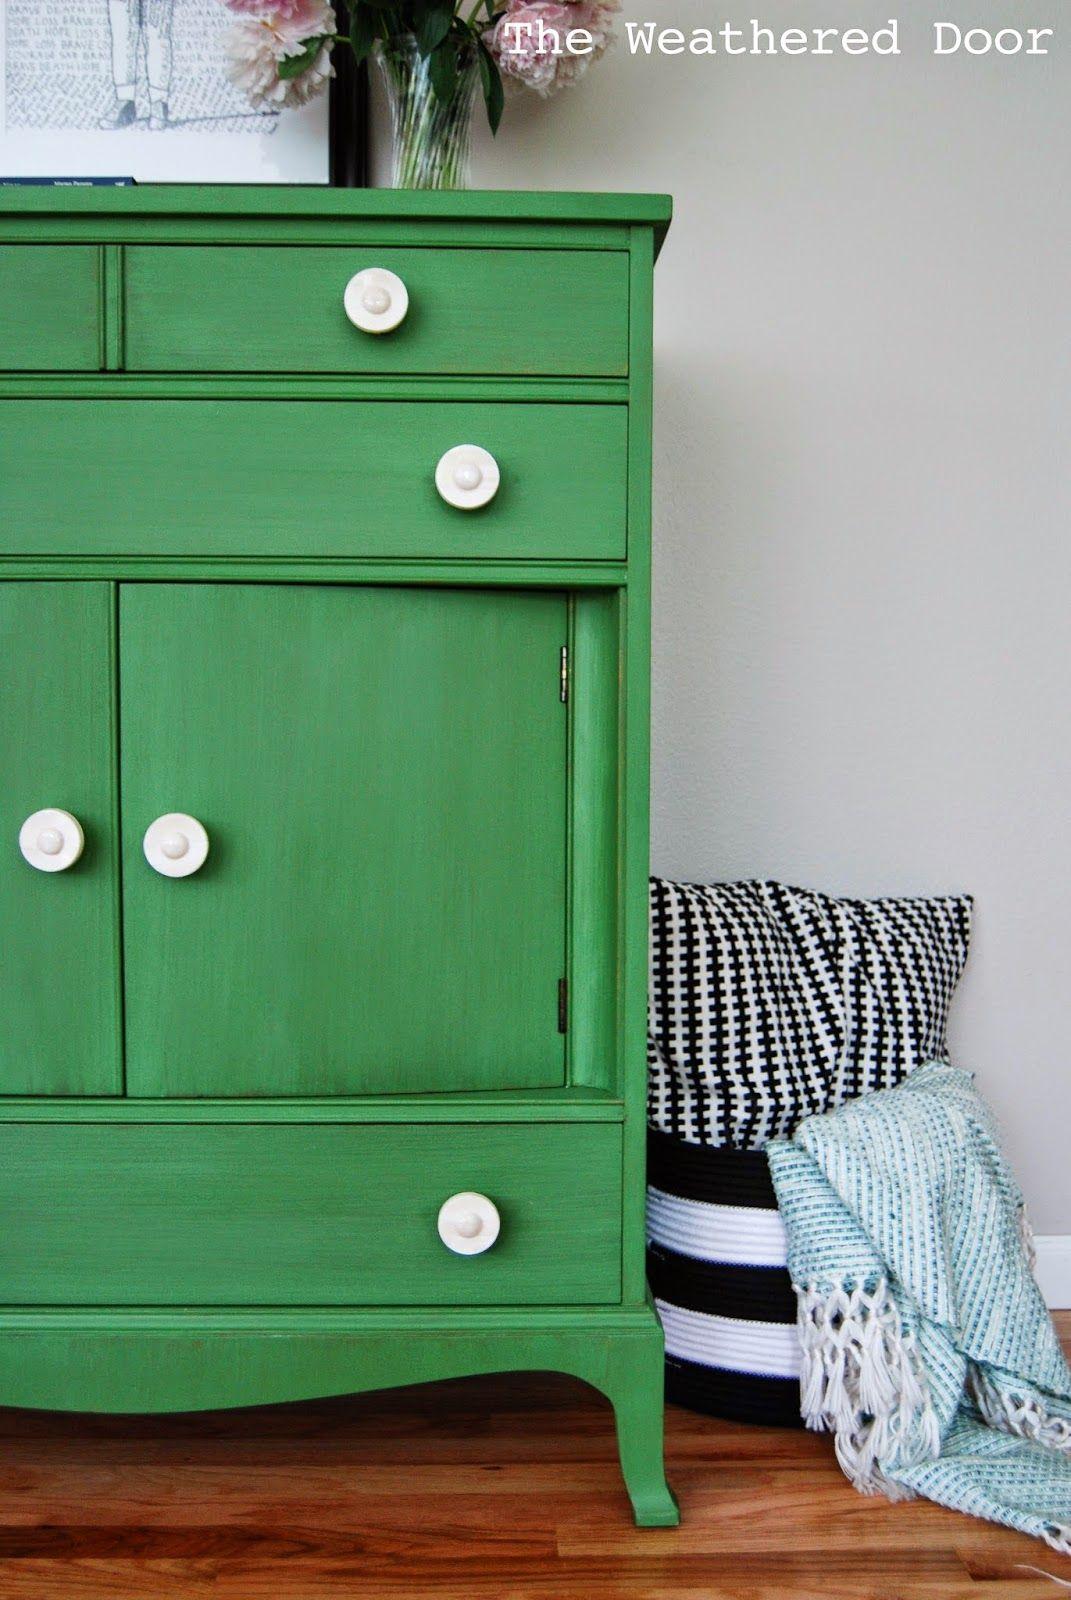 The Weathered Door: Tavern Green Milk Paint Dresser with Bone Knobs